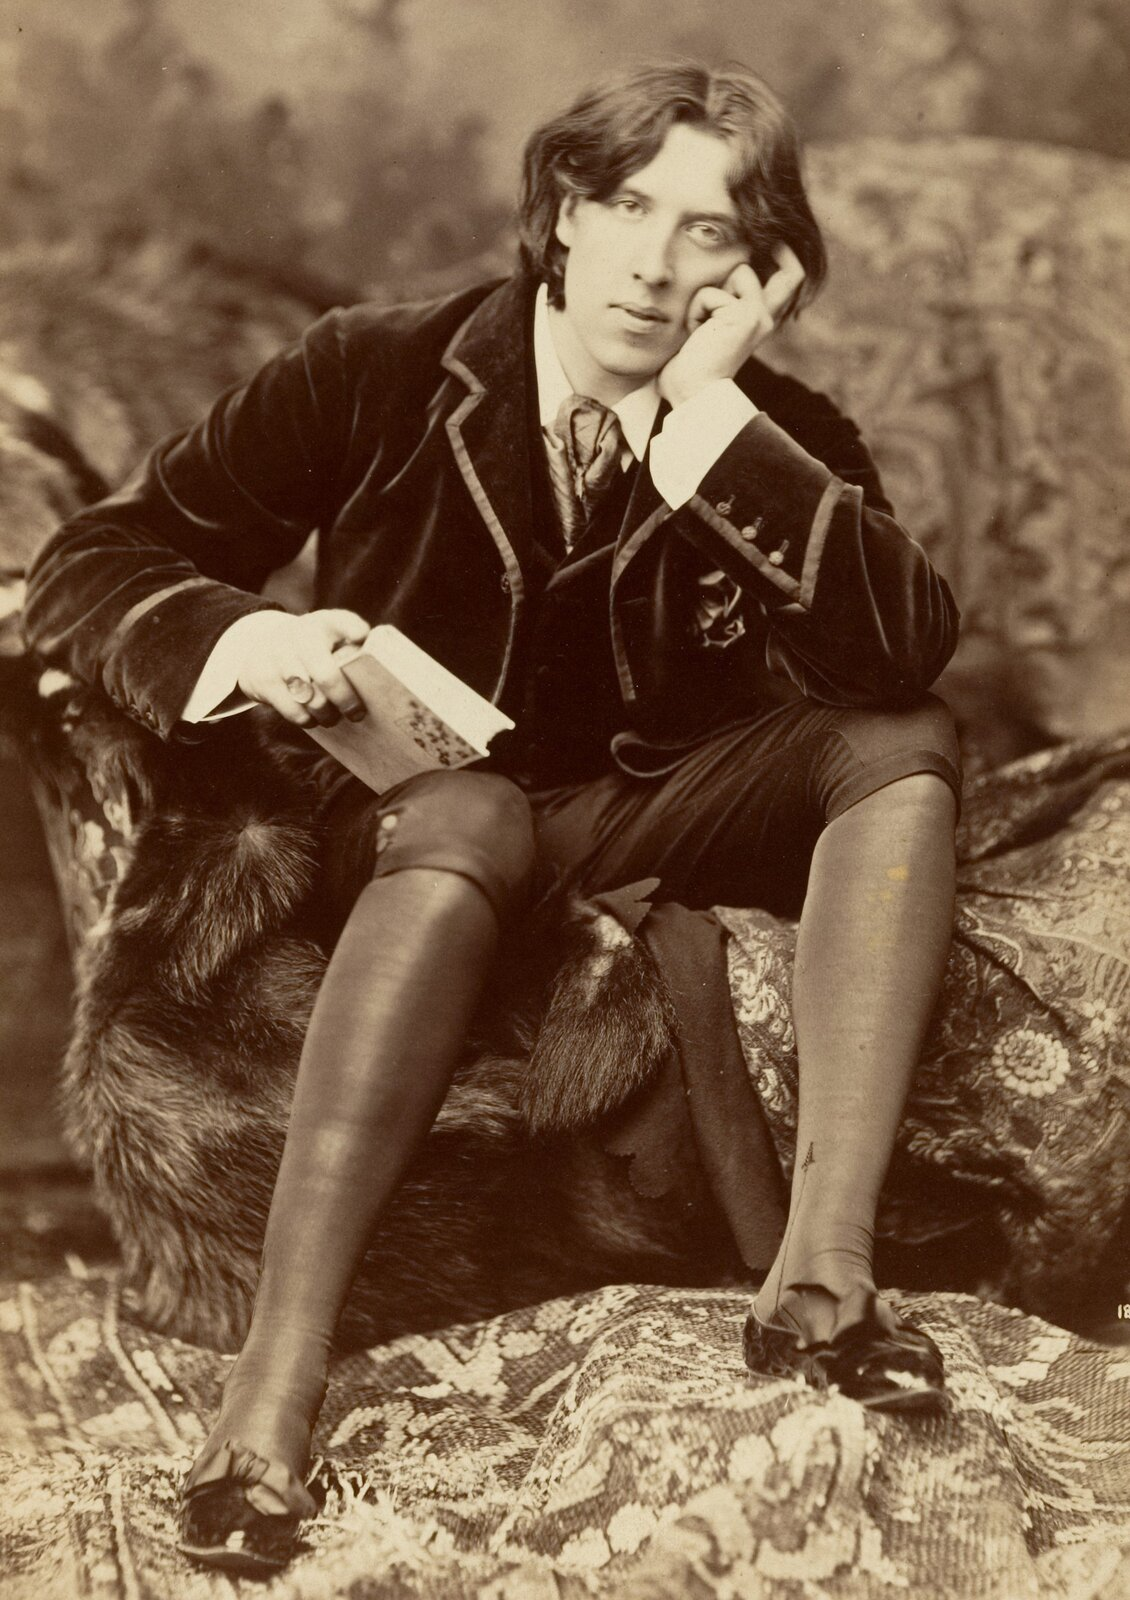 Portret Oscara Wilde'a Portret Oscara Wilde'a Źródło: Napoleon Sarony, ok. 1882, domena publiczna.